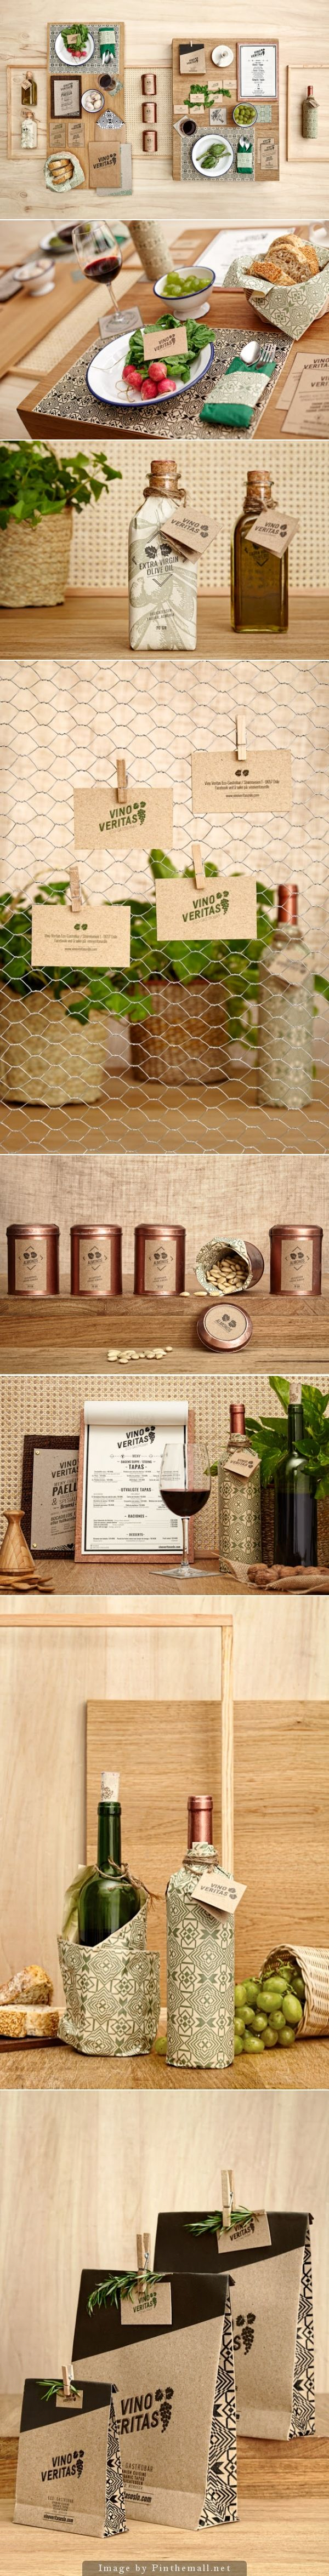 Vino Veritas Eco-Gastrobar Oslo - Creative Agency: Masquespacio - See more at: http://www.packagingoftheworld.com/